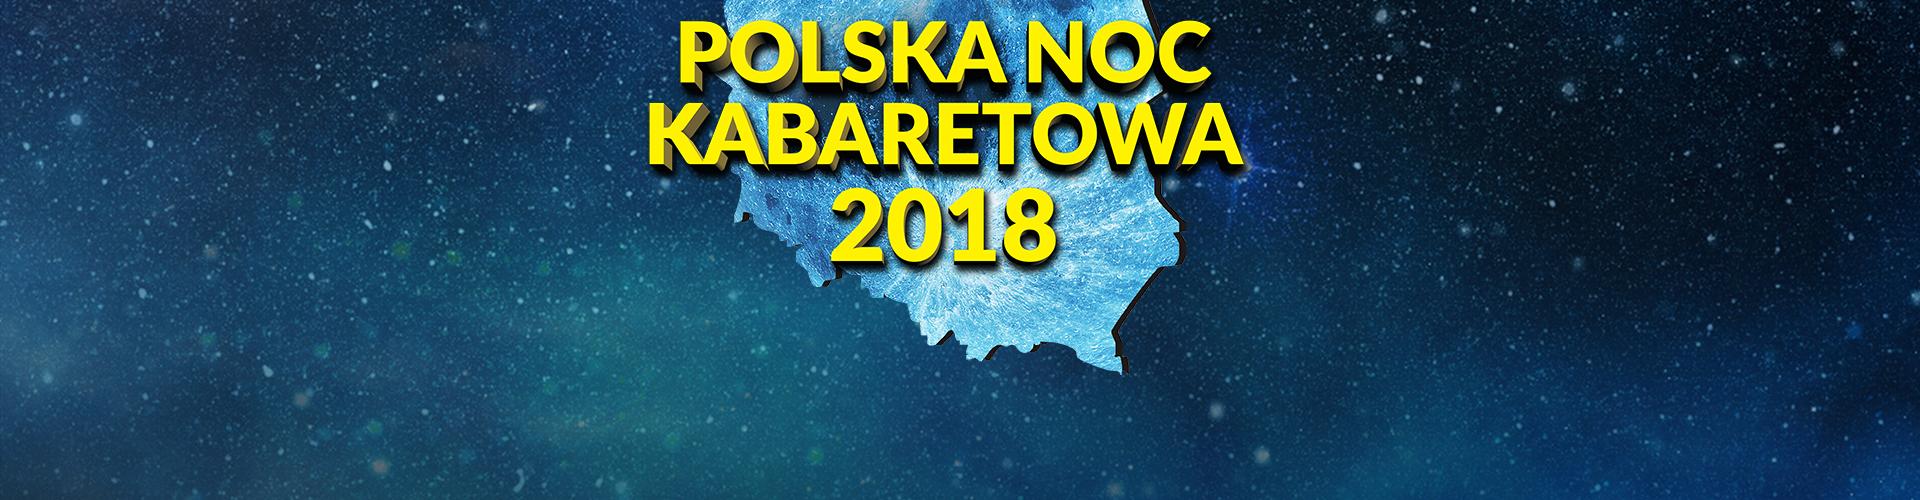 slide_polska_noc_kabaretowa_2018